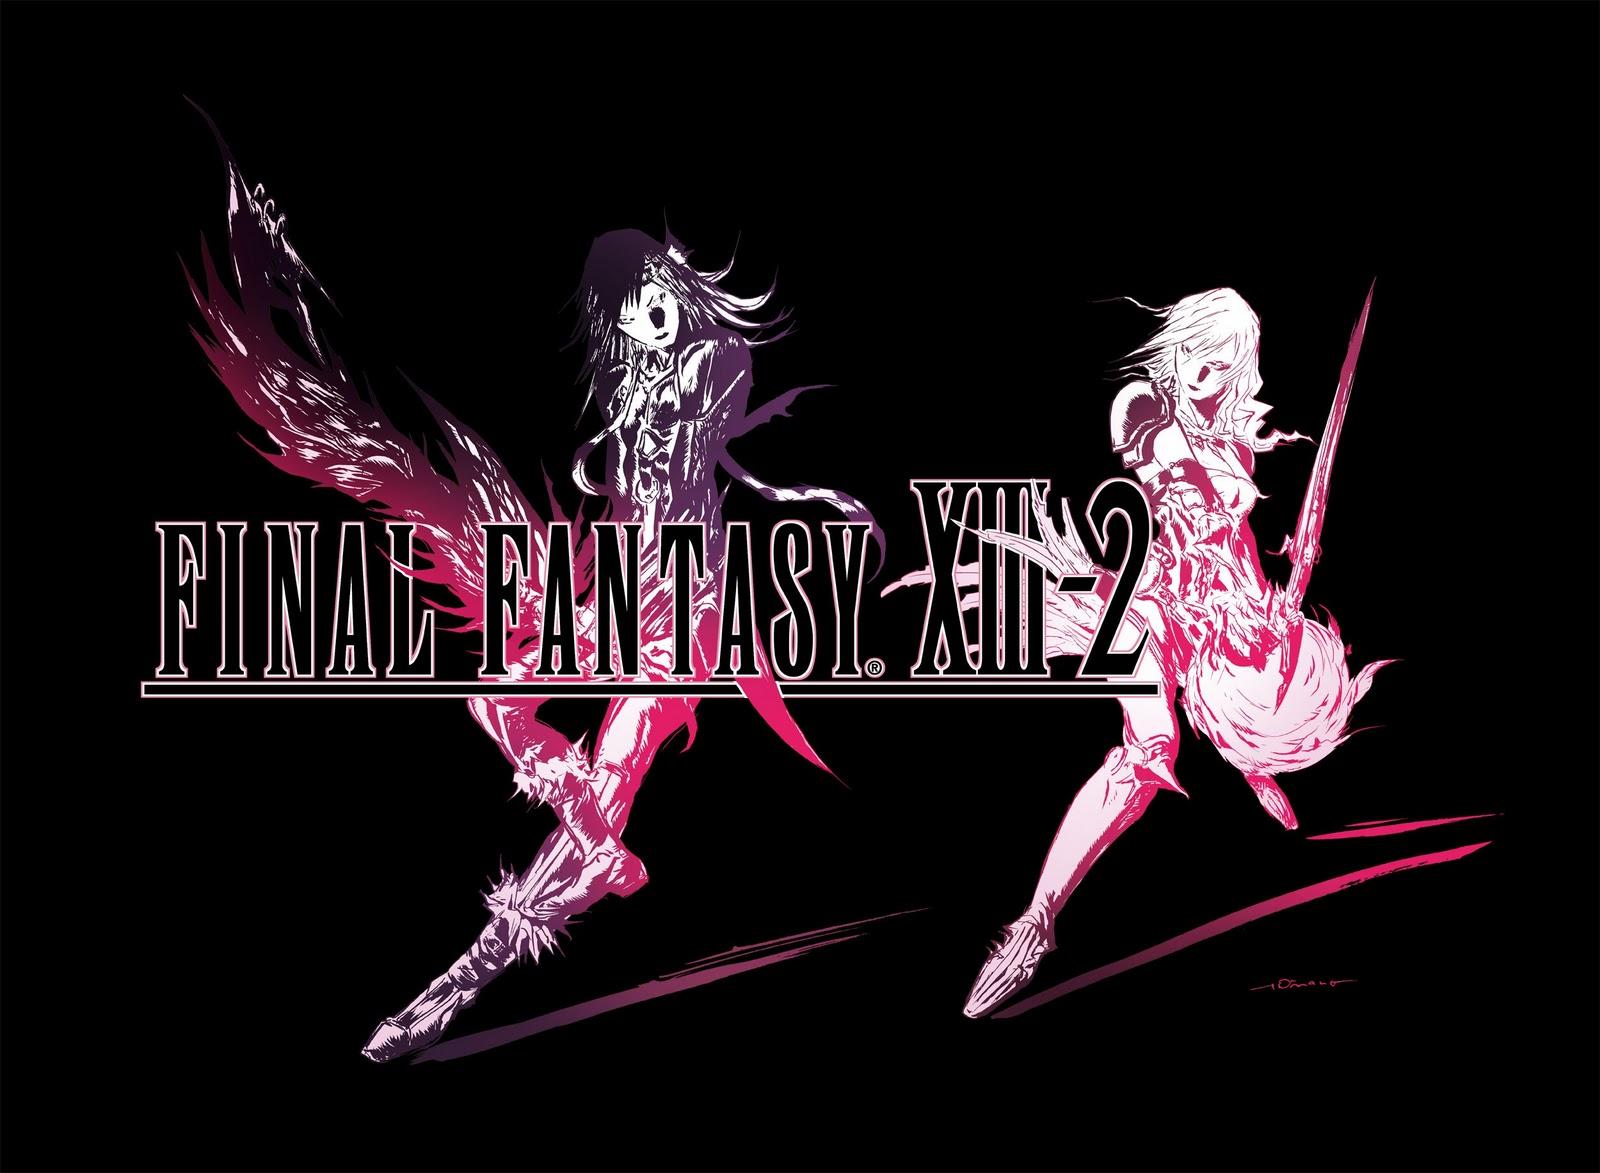 http://3.bp.blogspot.com/-bD3LFCsJe-s/TymwYSGOzkI/AAAAAAAAB90/4BCYsH-pyR0/s1600/final-fantasy-xiii2-logo.jpg